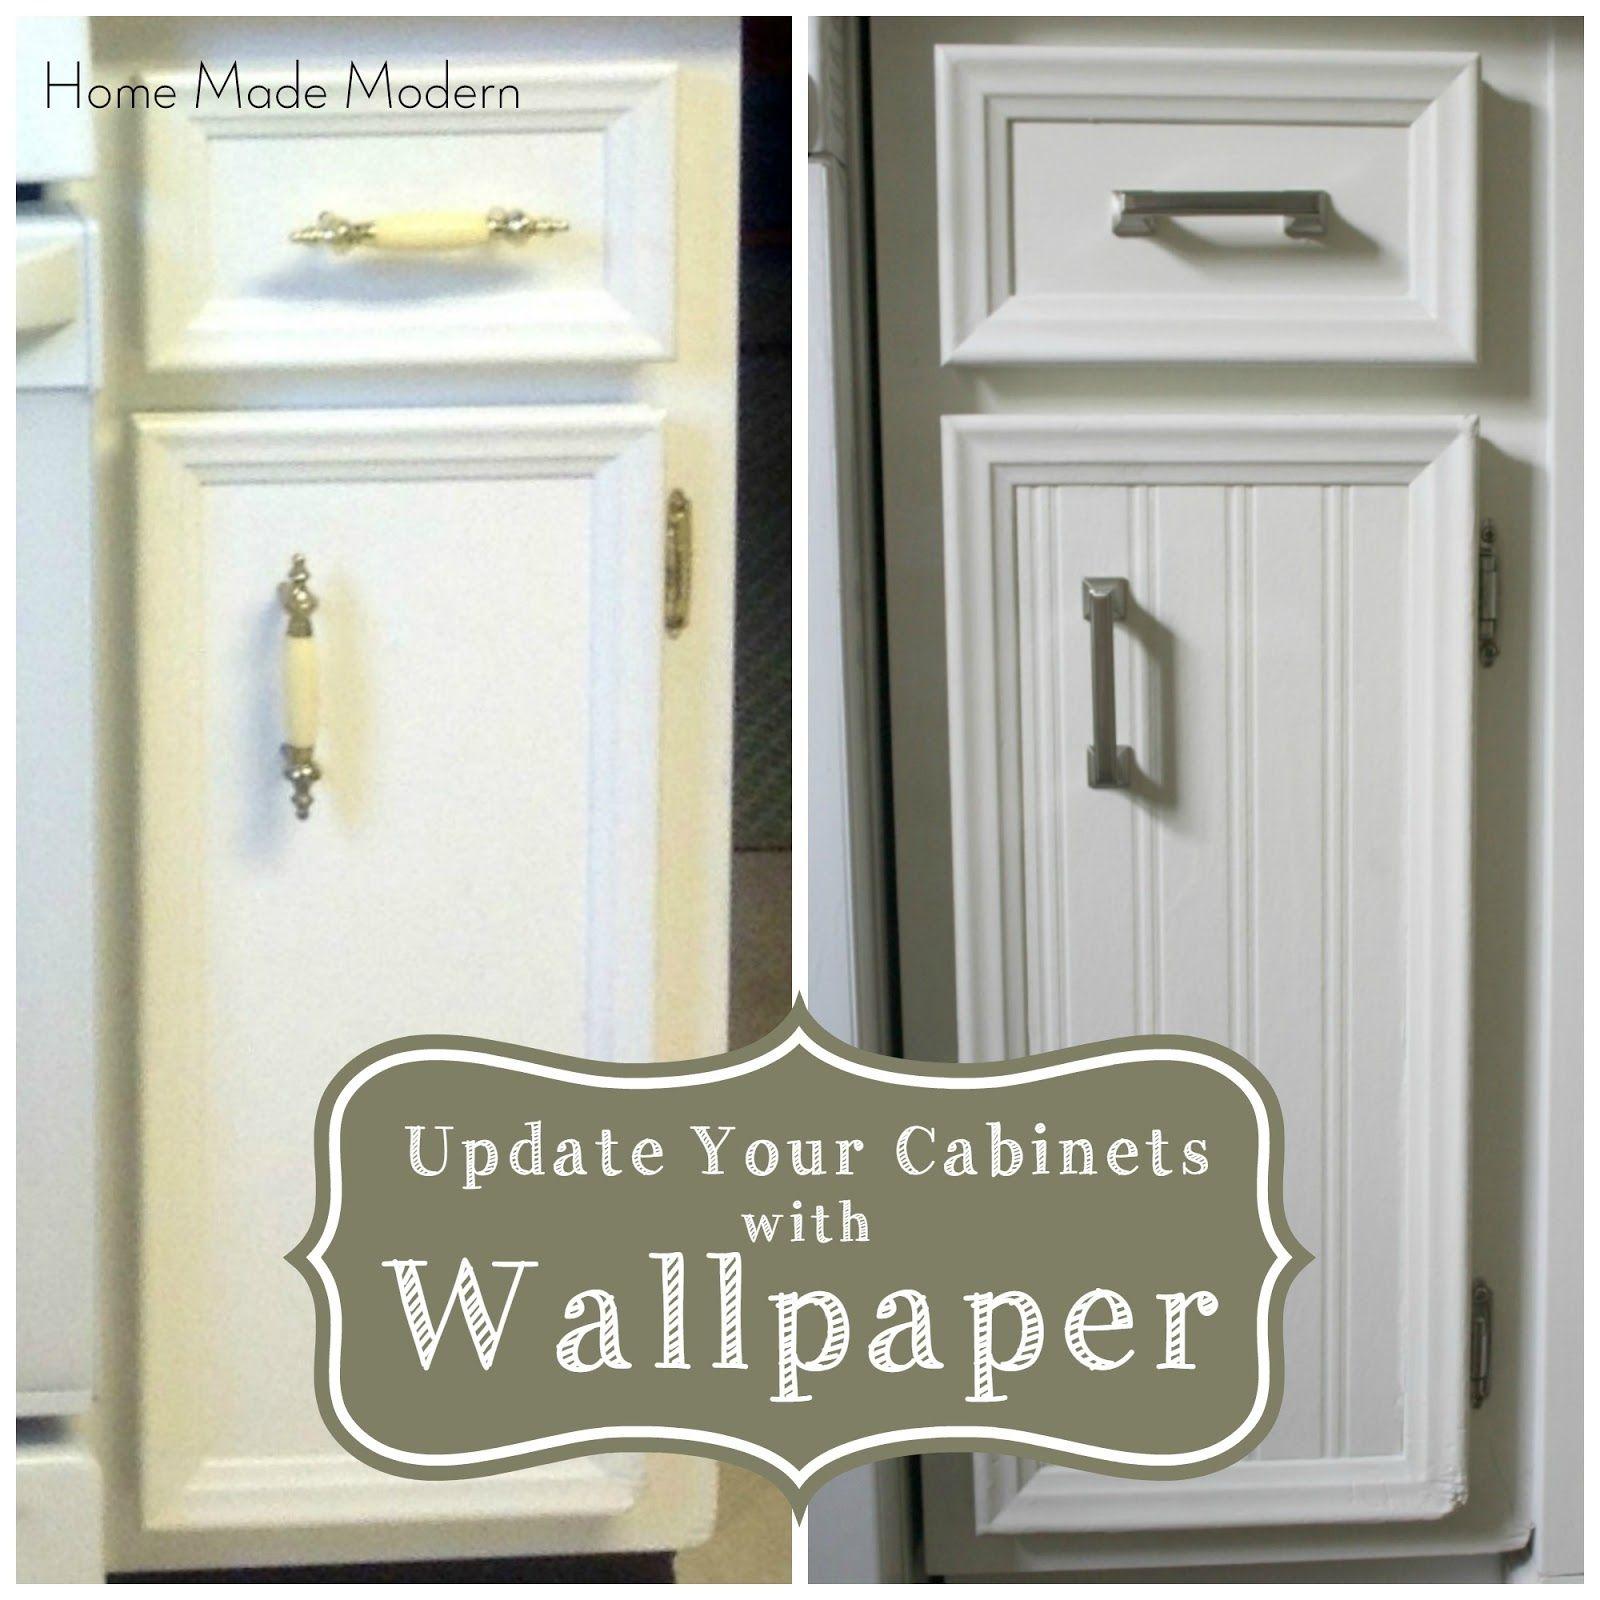 Updated Kitchen Cabinets Home Made Modern Wallpaper For Kitchen Cabinets Update Kitchen Cabinets Kitchen Wallpaper